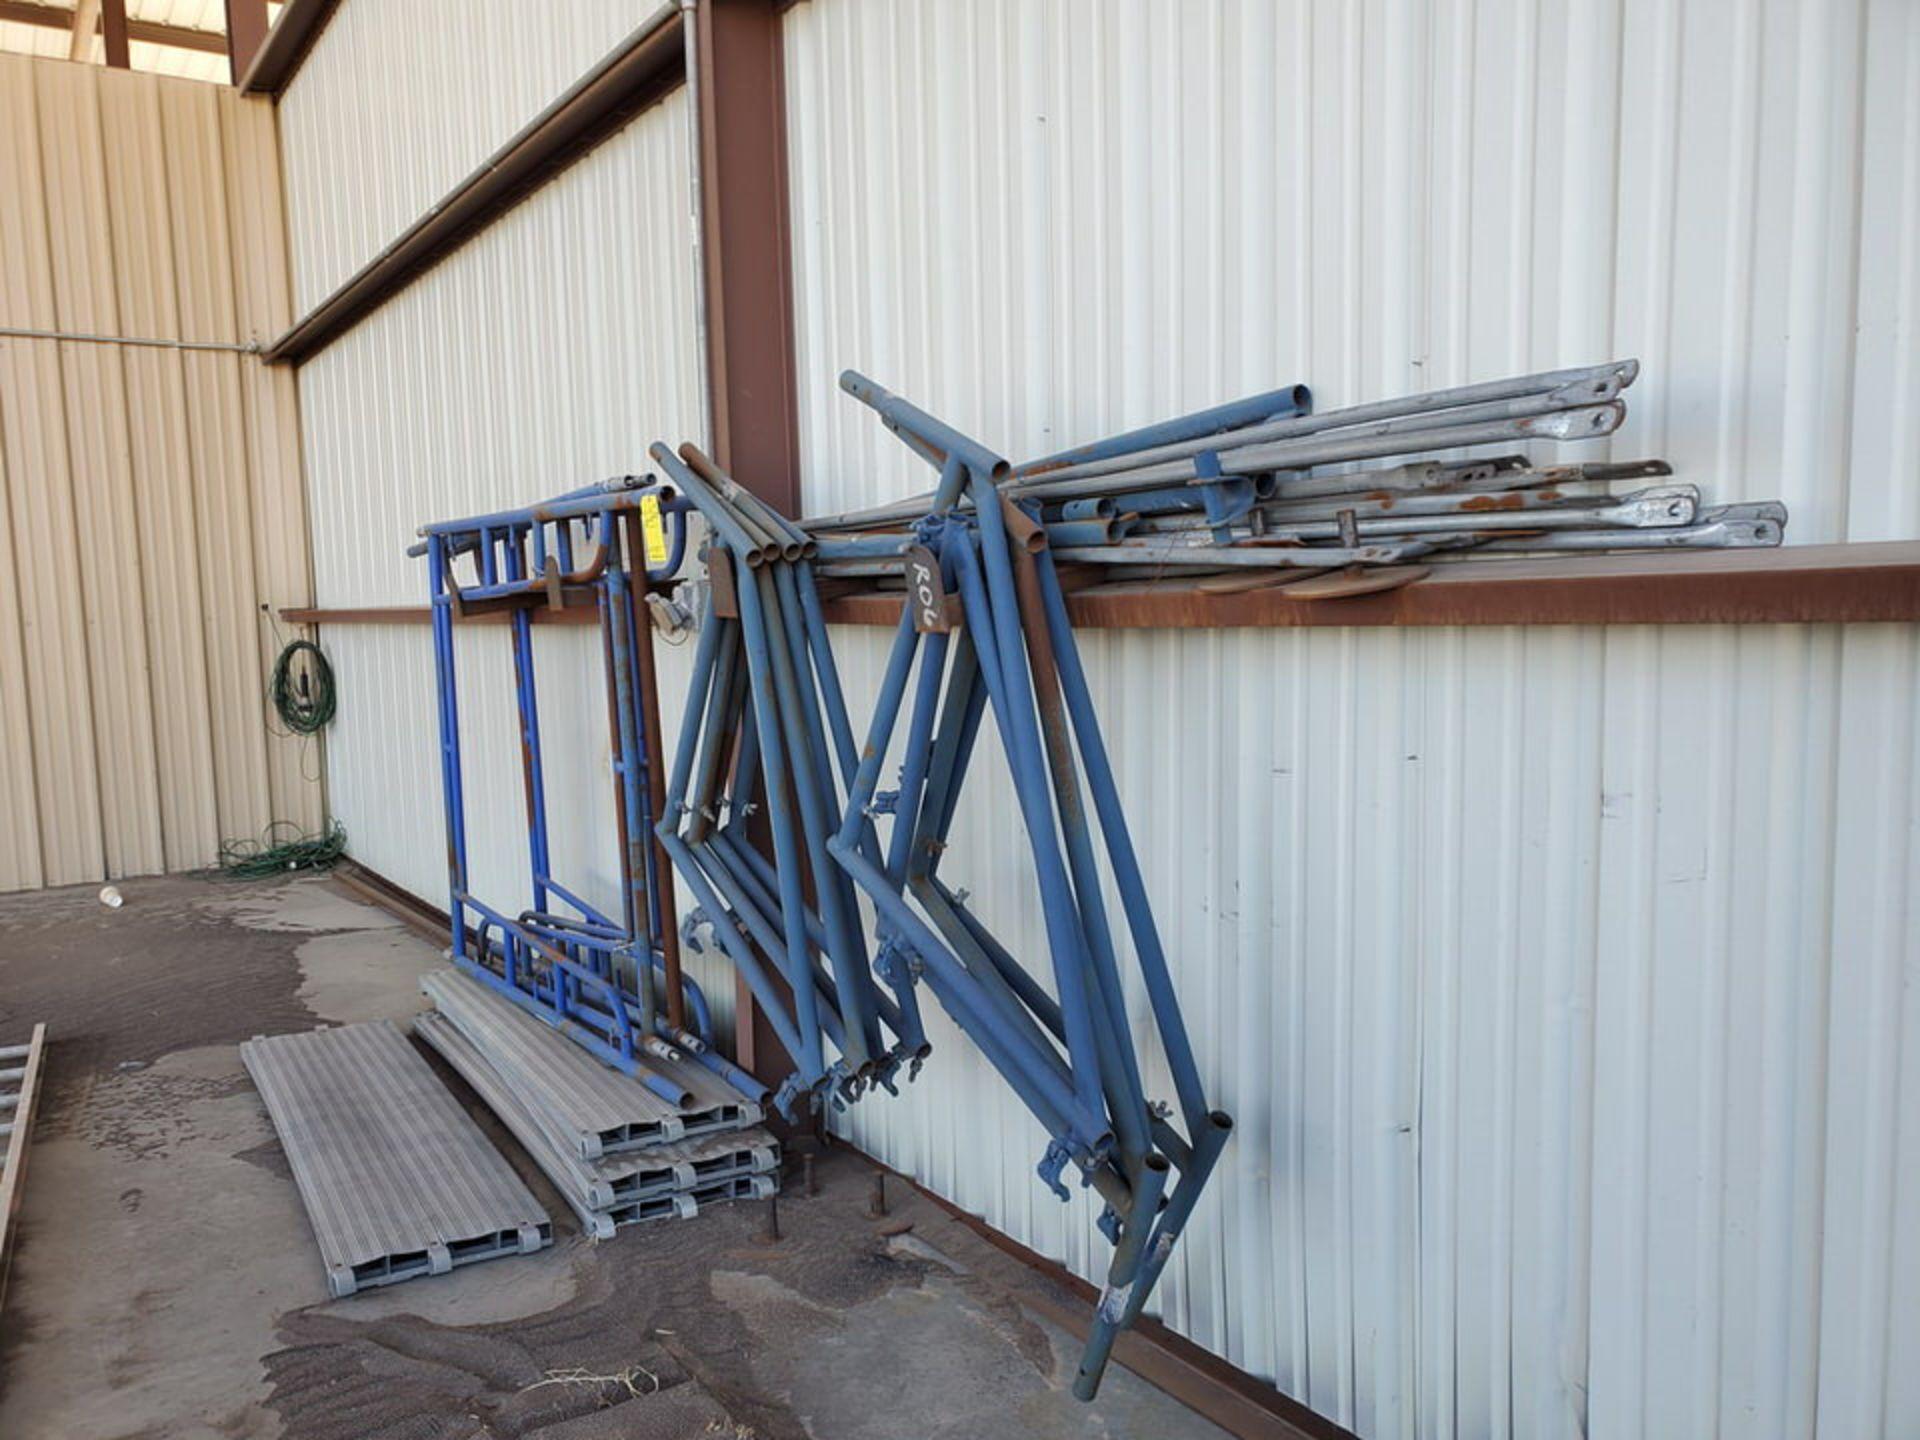 Scaffold W' 16' Fixed Alum. Ladder - Image 6 of 10